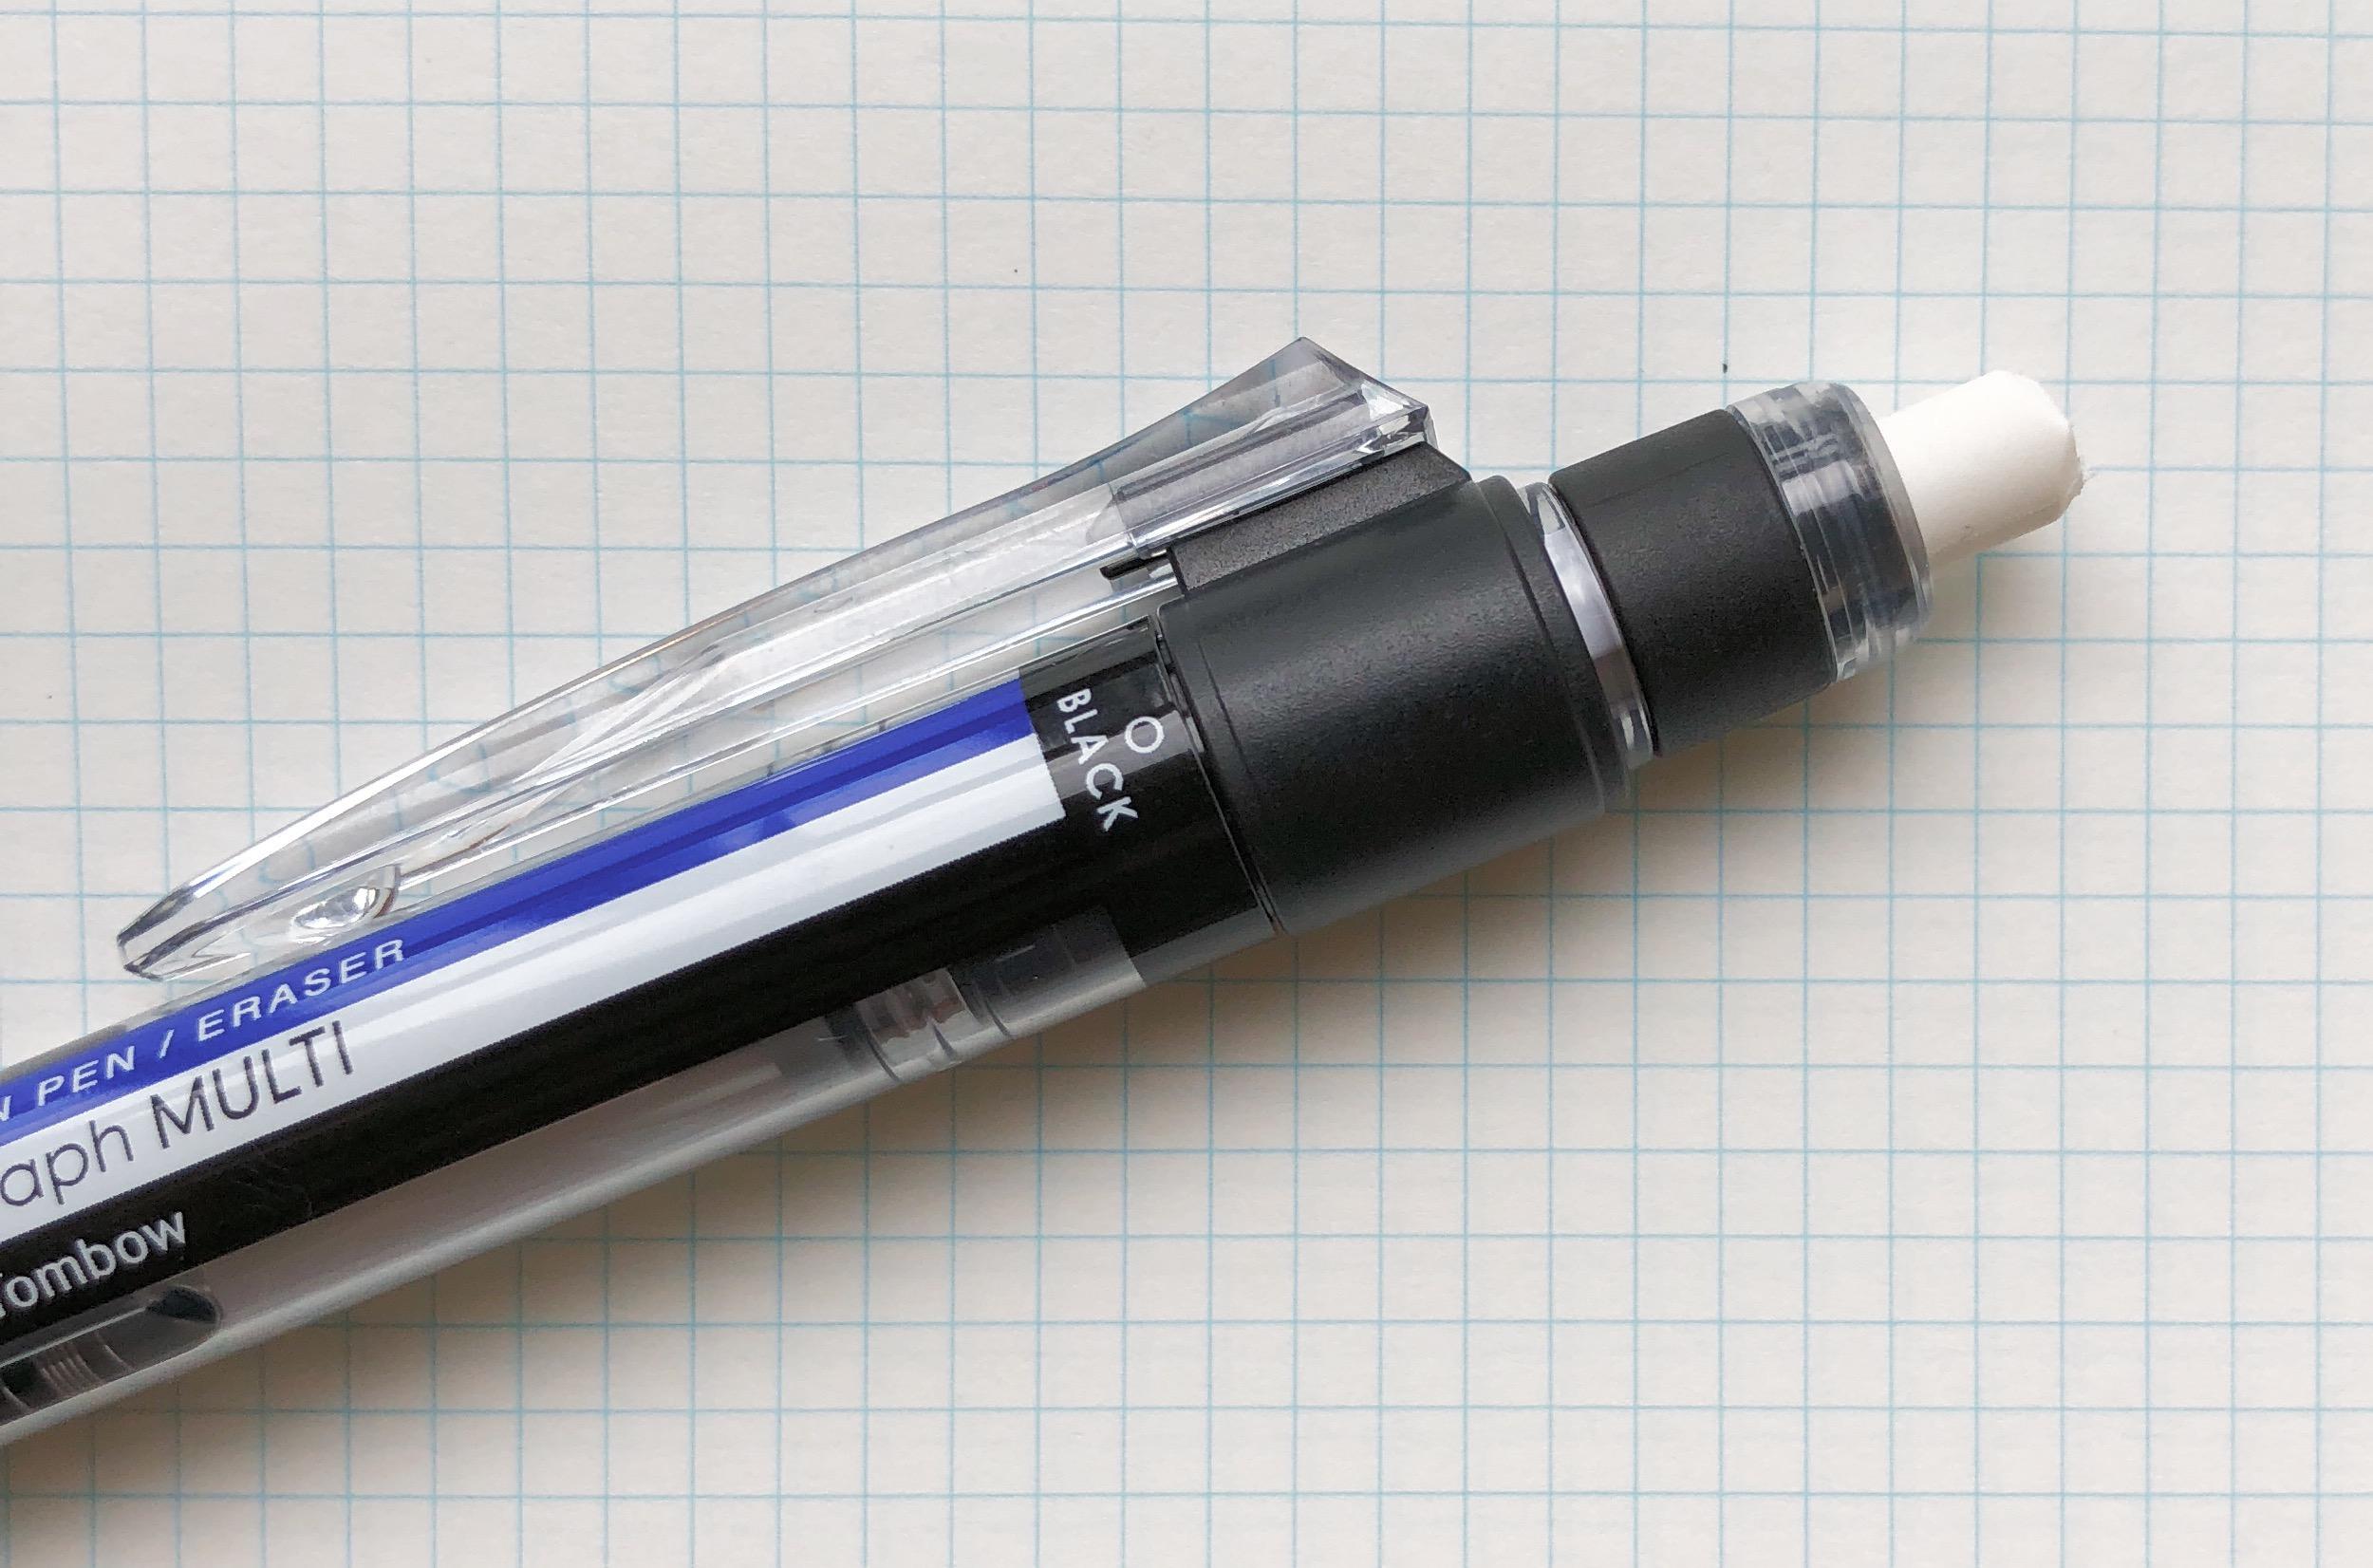 Tombow Mono Graph Multi Pen Eraser